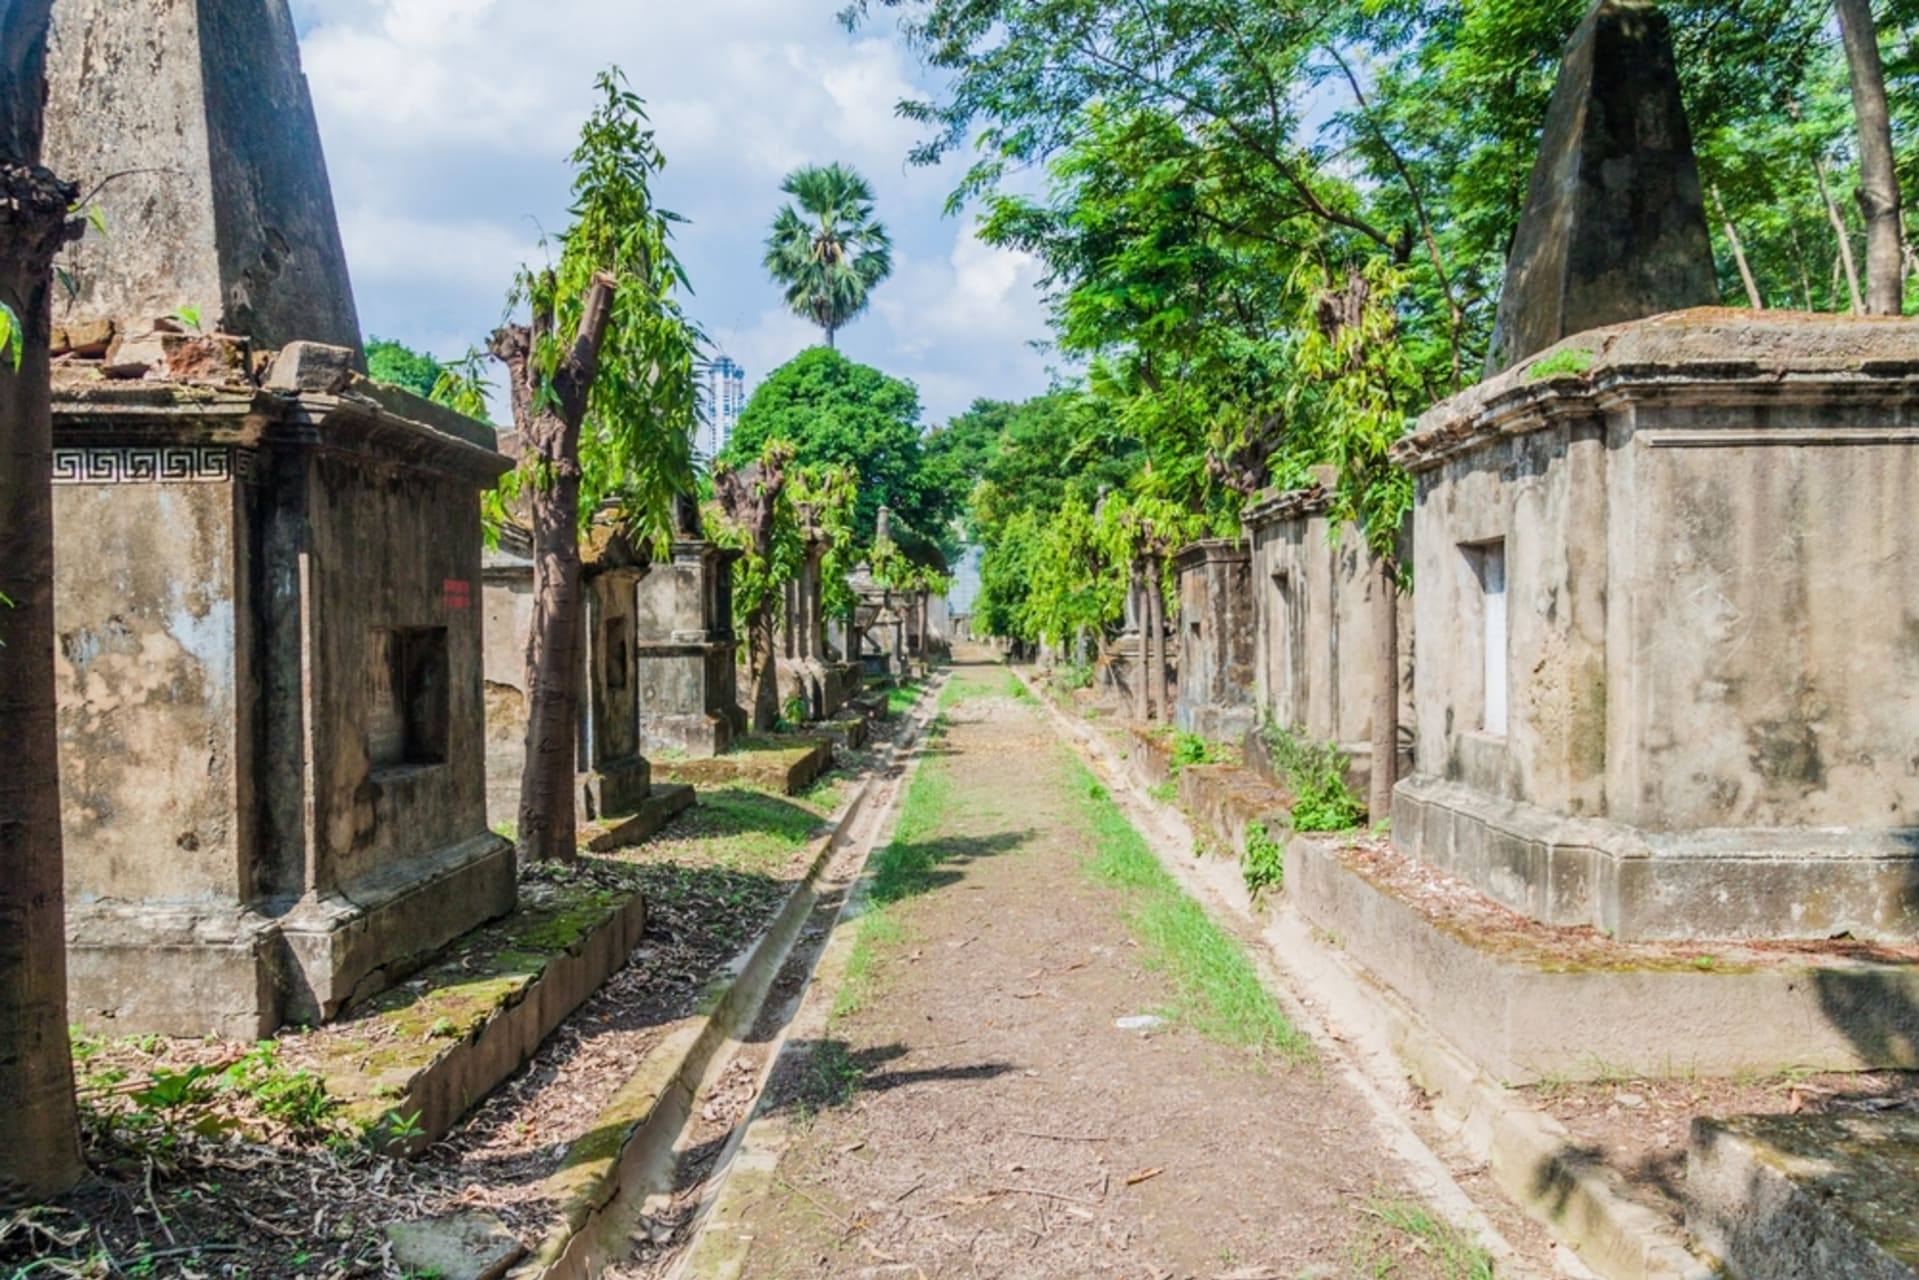 Kolkata - South Park Street Cemetery of Kolkata